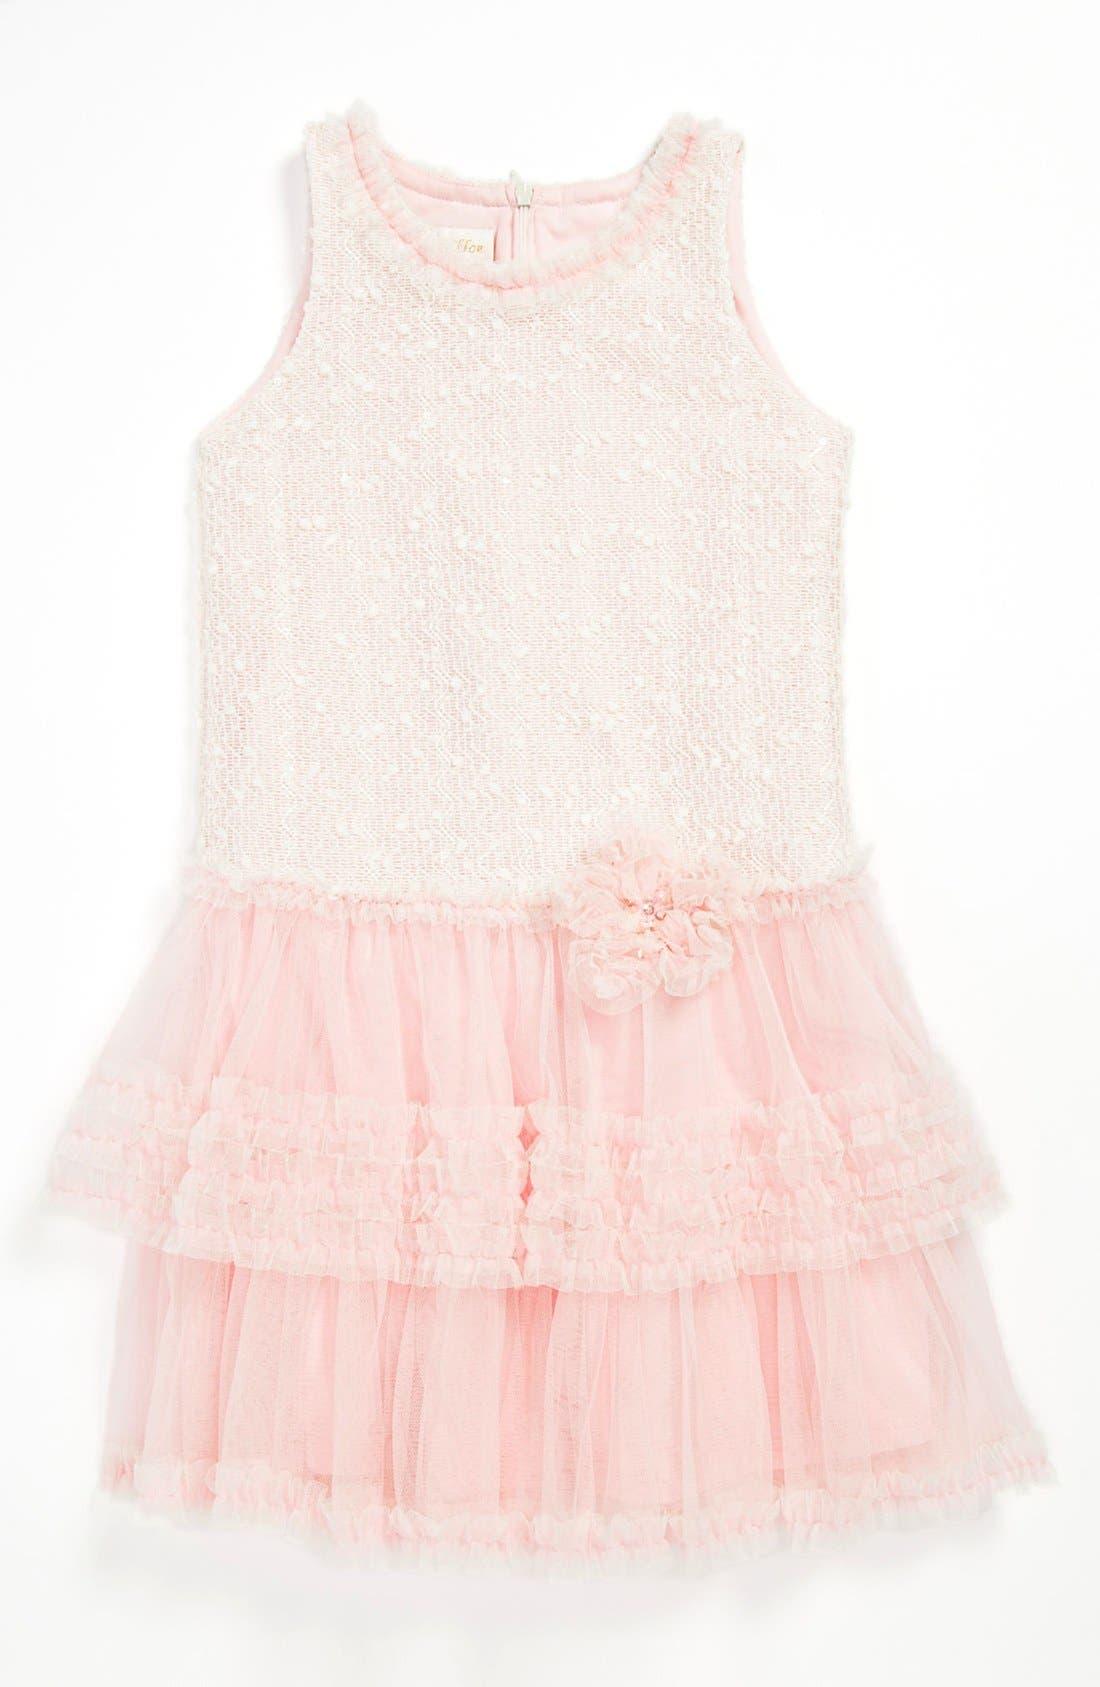 Alternate Image 1 Selected - Isobella & Chloe Drop Waist Dress (Little Girls)